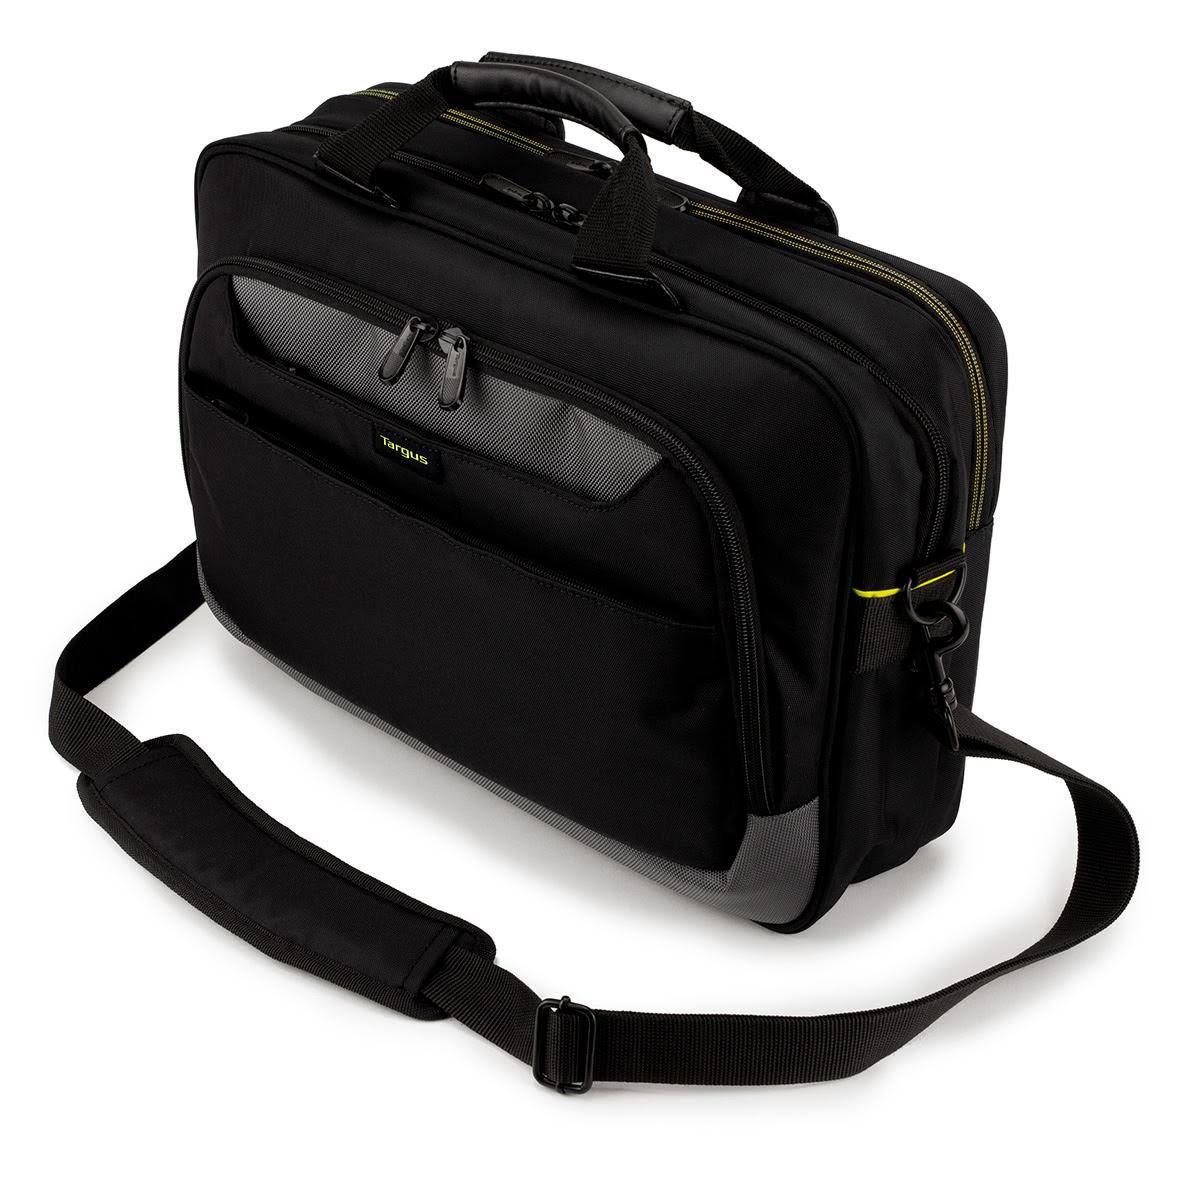 "TCG470EU CityGear 15-17.3"" Topload Laptop Case Targus - 3"